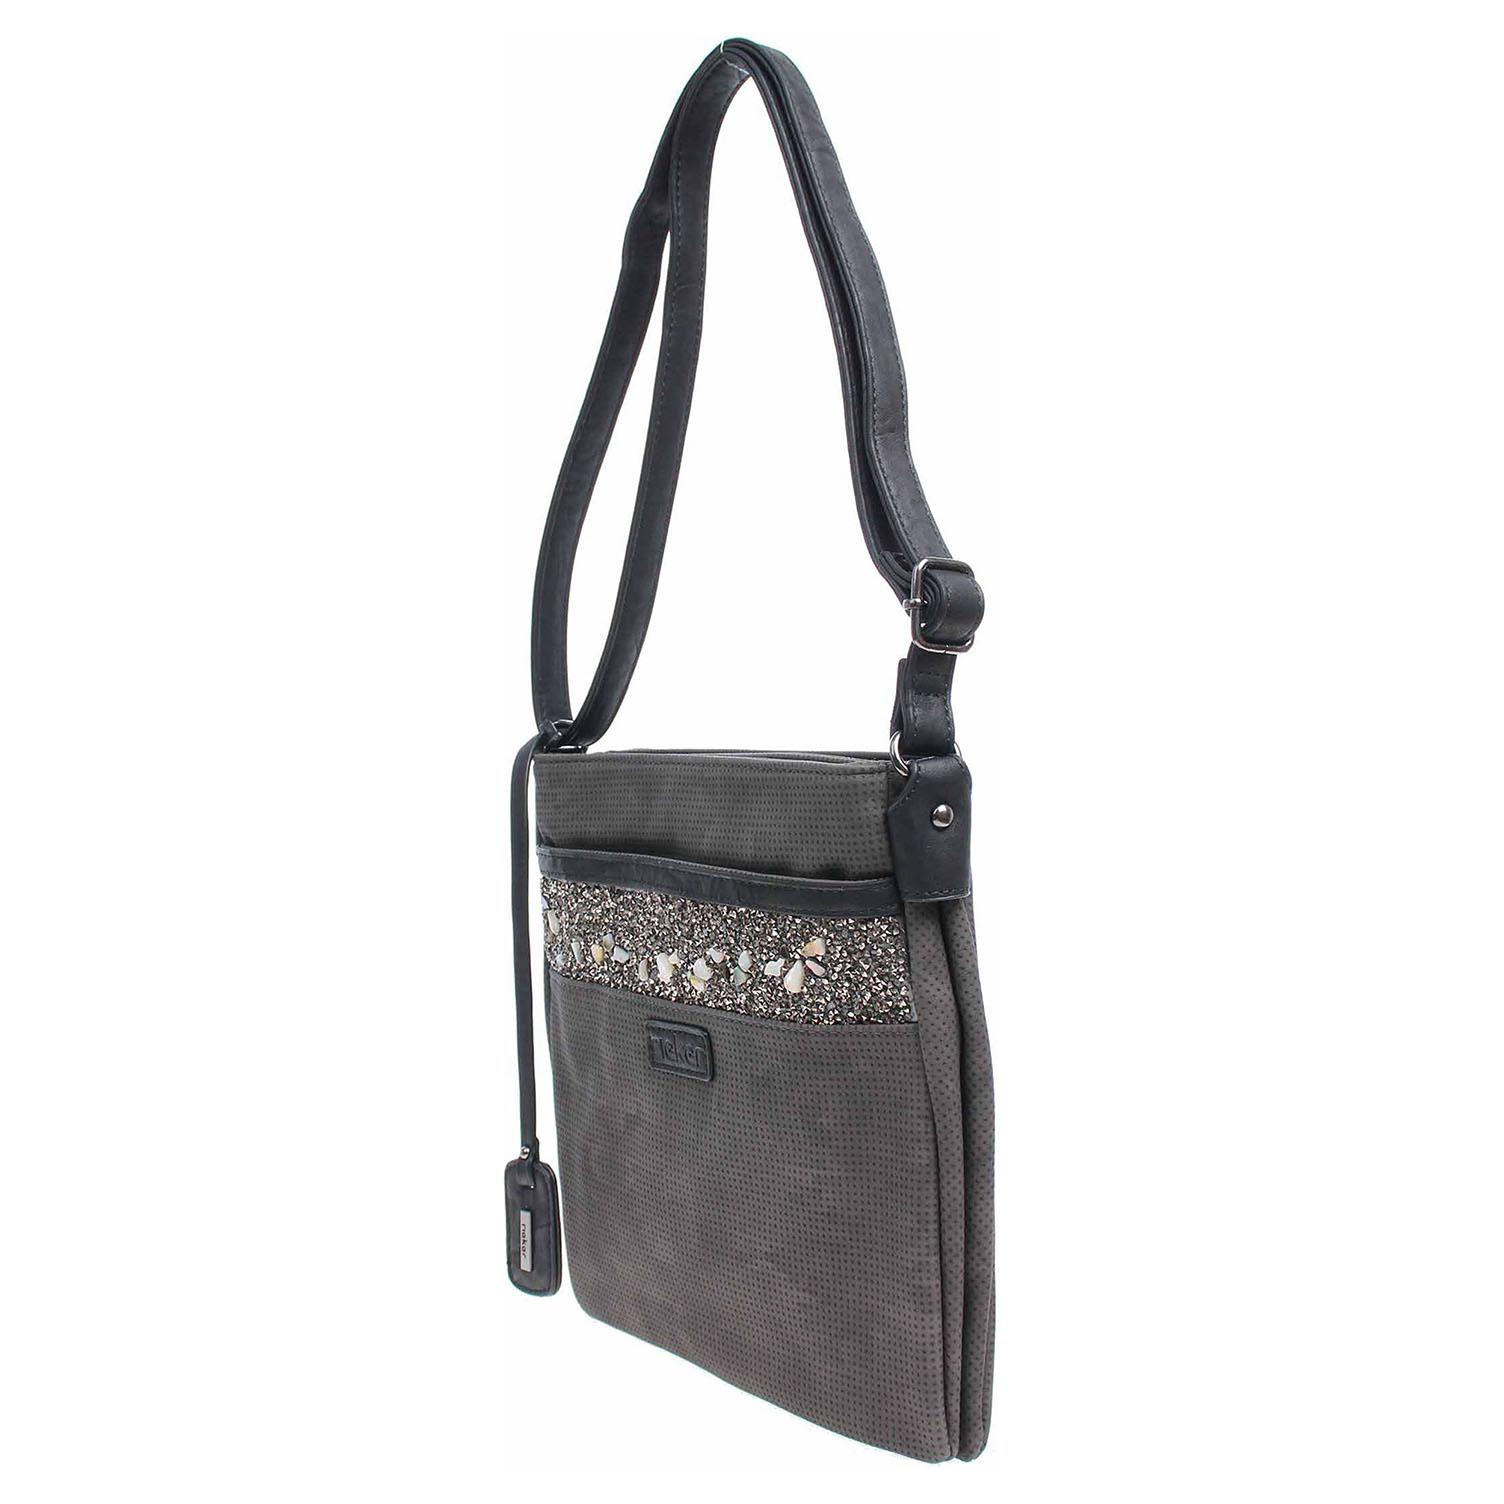 Ecco Rieker dámská kabelka H1014-45 rauch 11891435 b7c993d6ae1